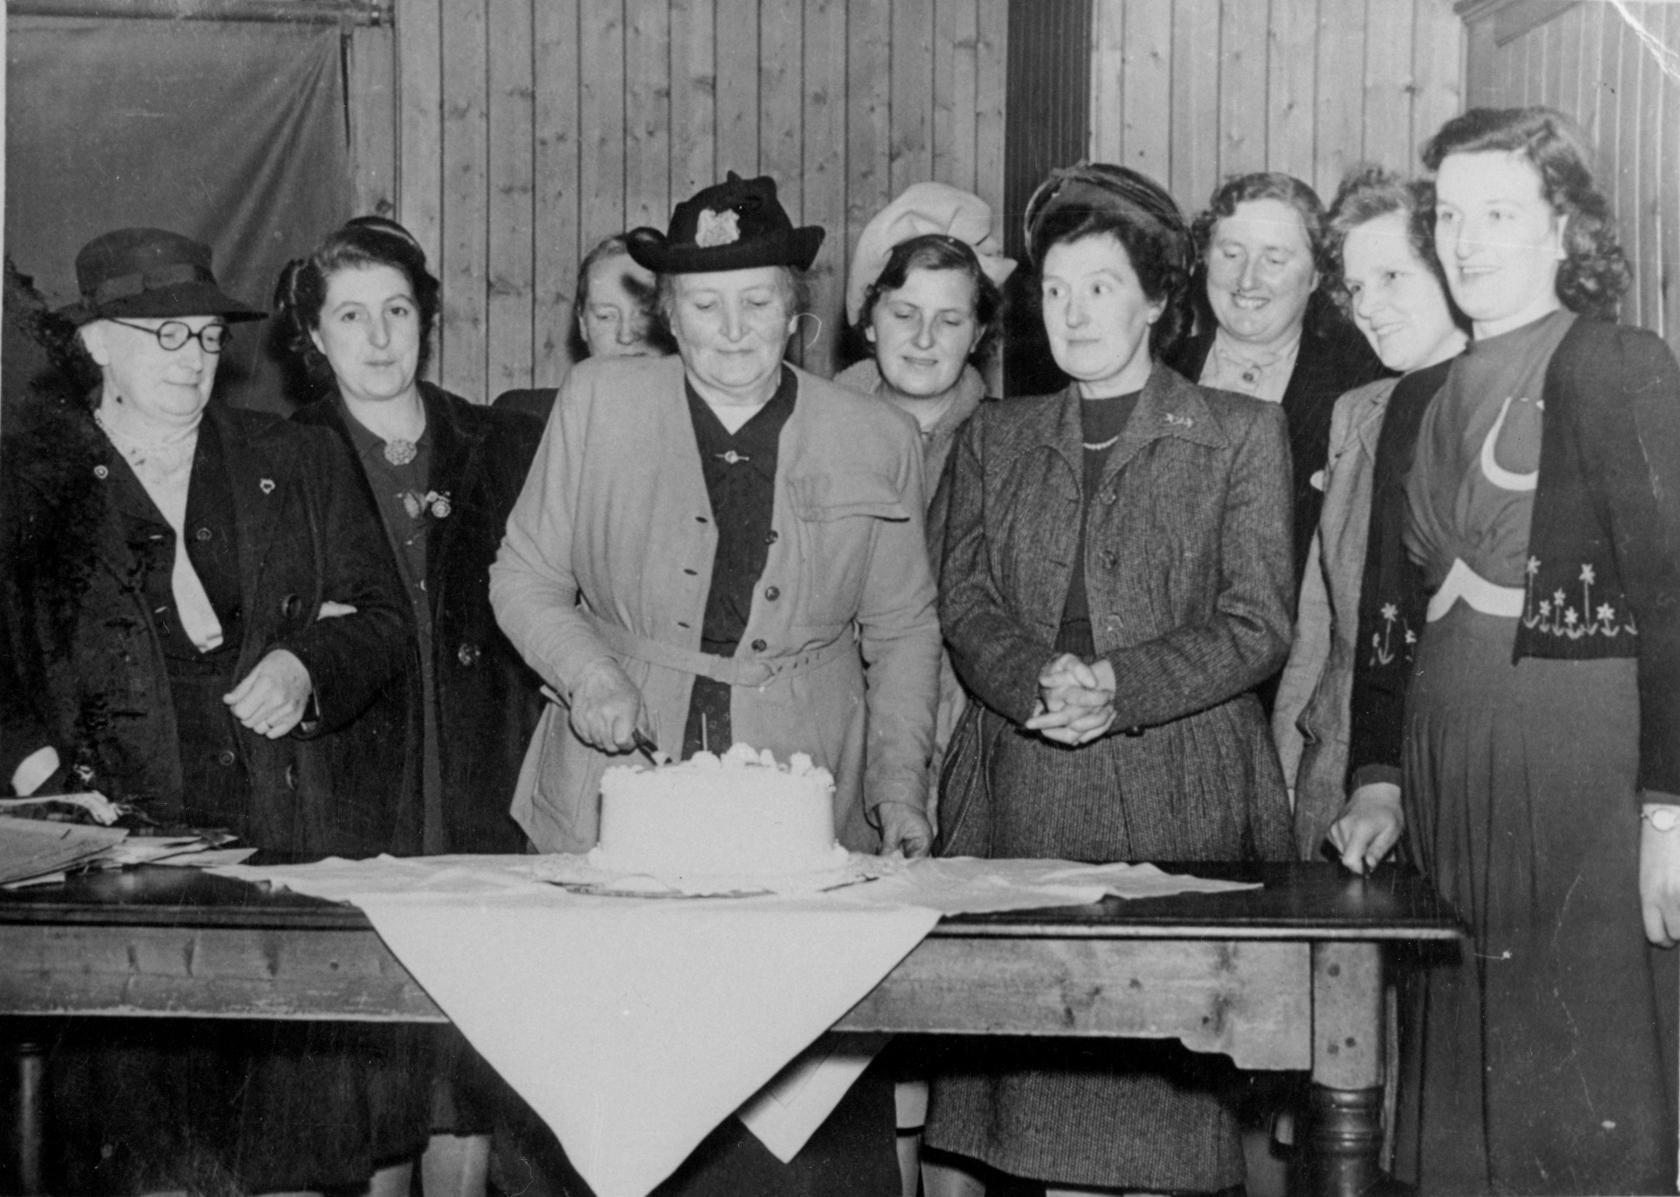 Scottish Women's Rural Institute Celebration 1950s